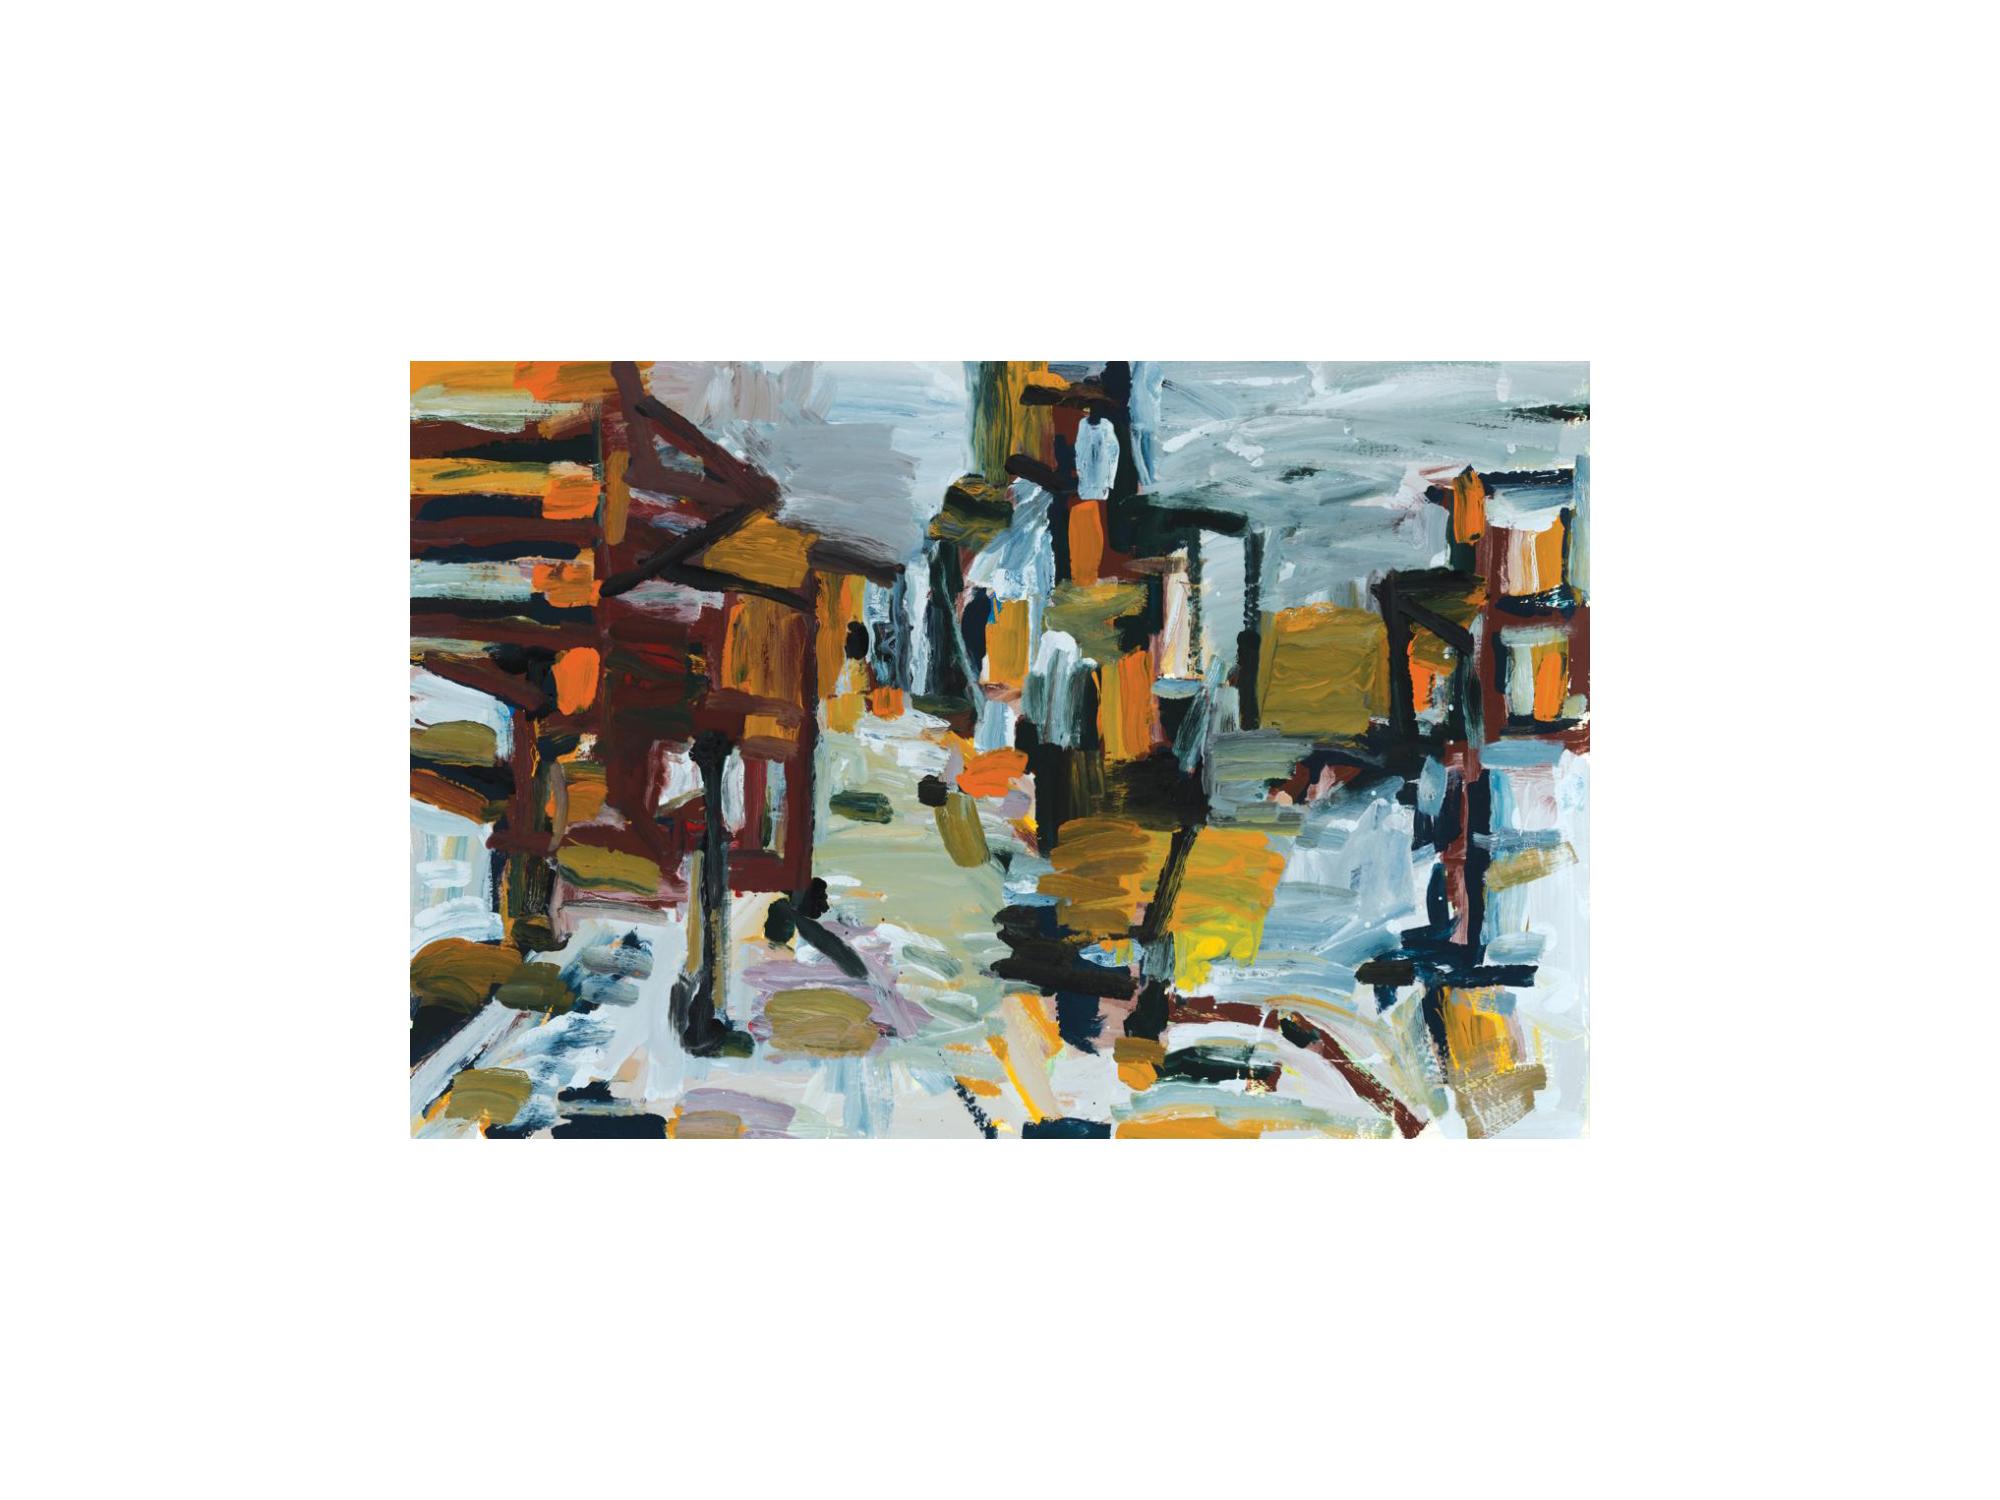 James Clayden   Junction ,2016 enamel on canvas 61 x 91.5cm   ARTIST BIO